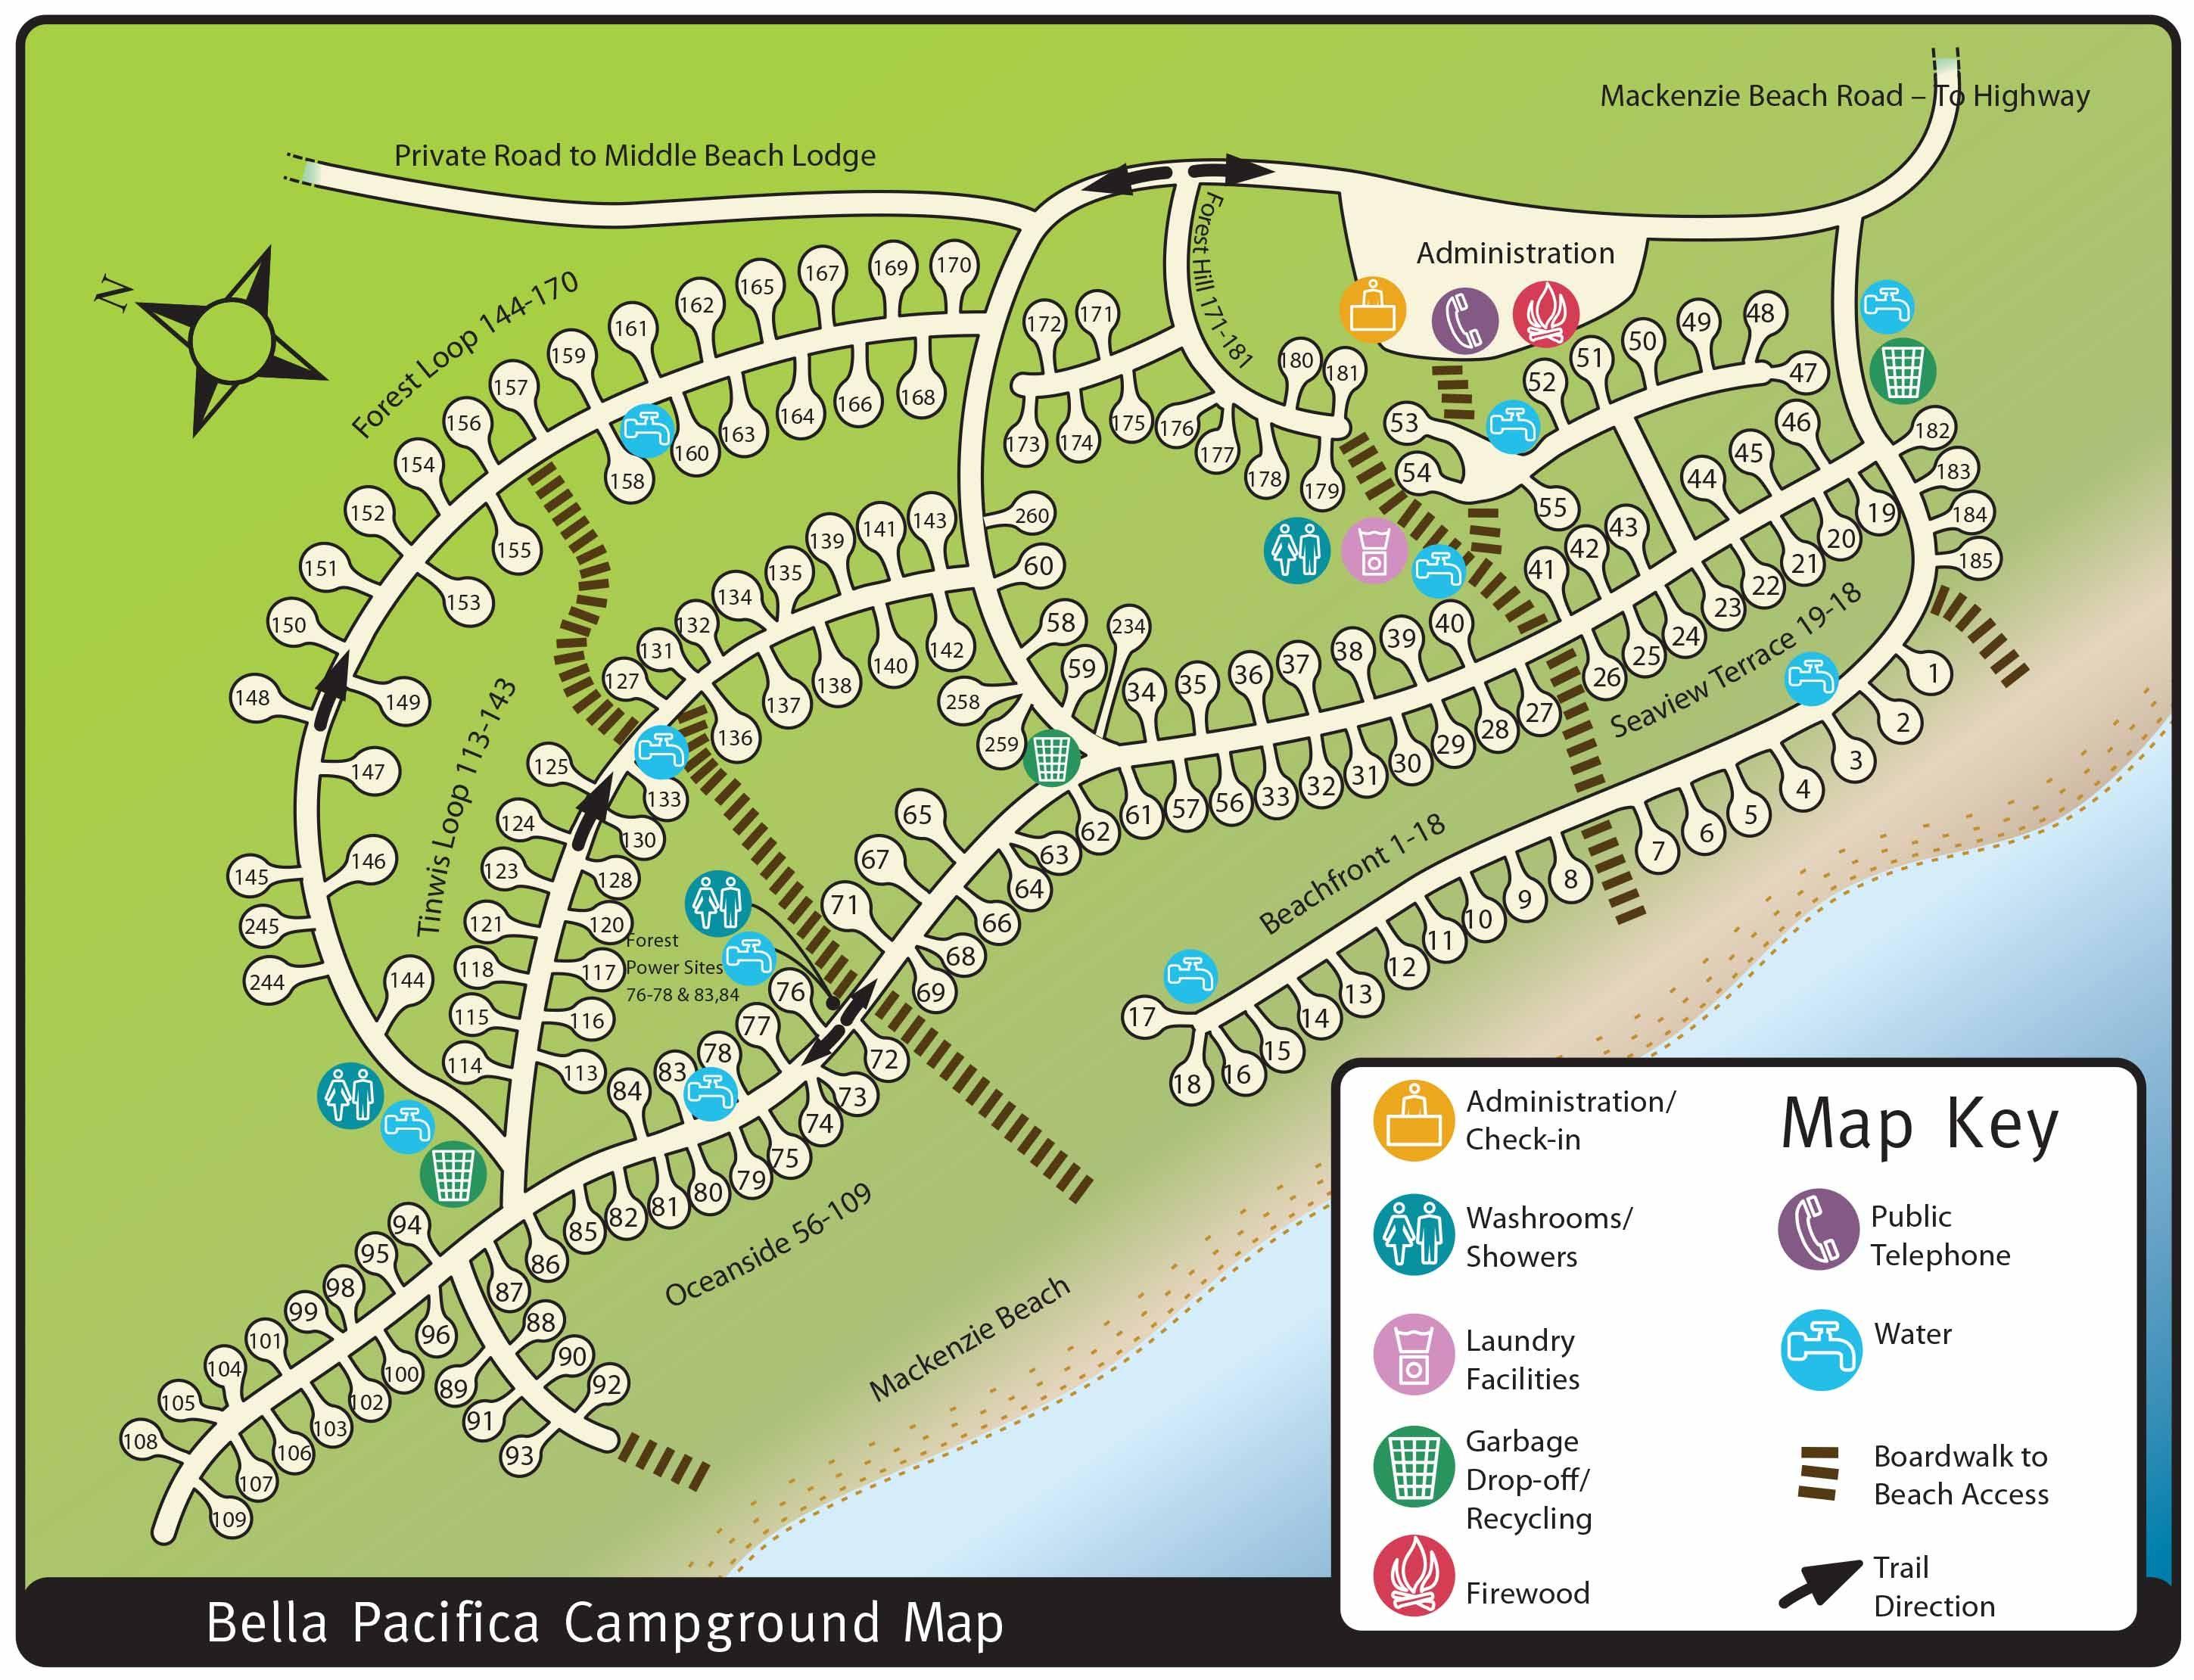 Tofino Campgrounds And Tofino Camping Information Vancouver Island Tofino Campground Vancouver Island